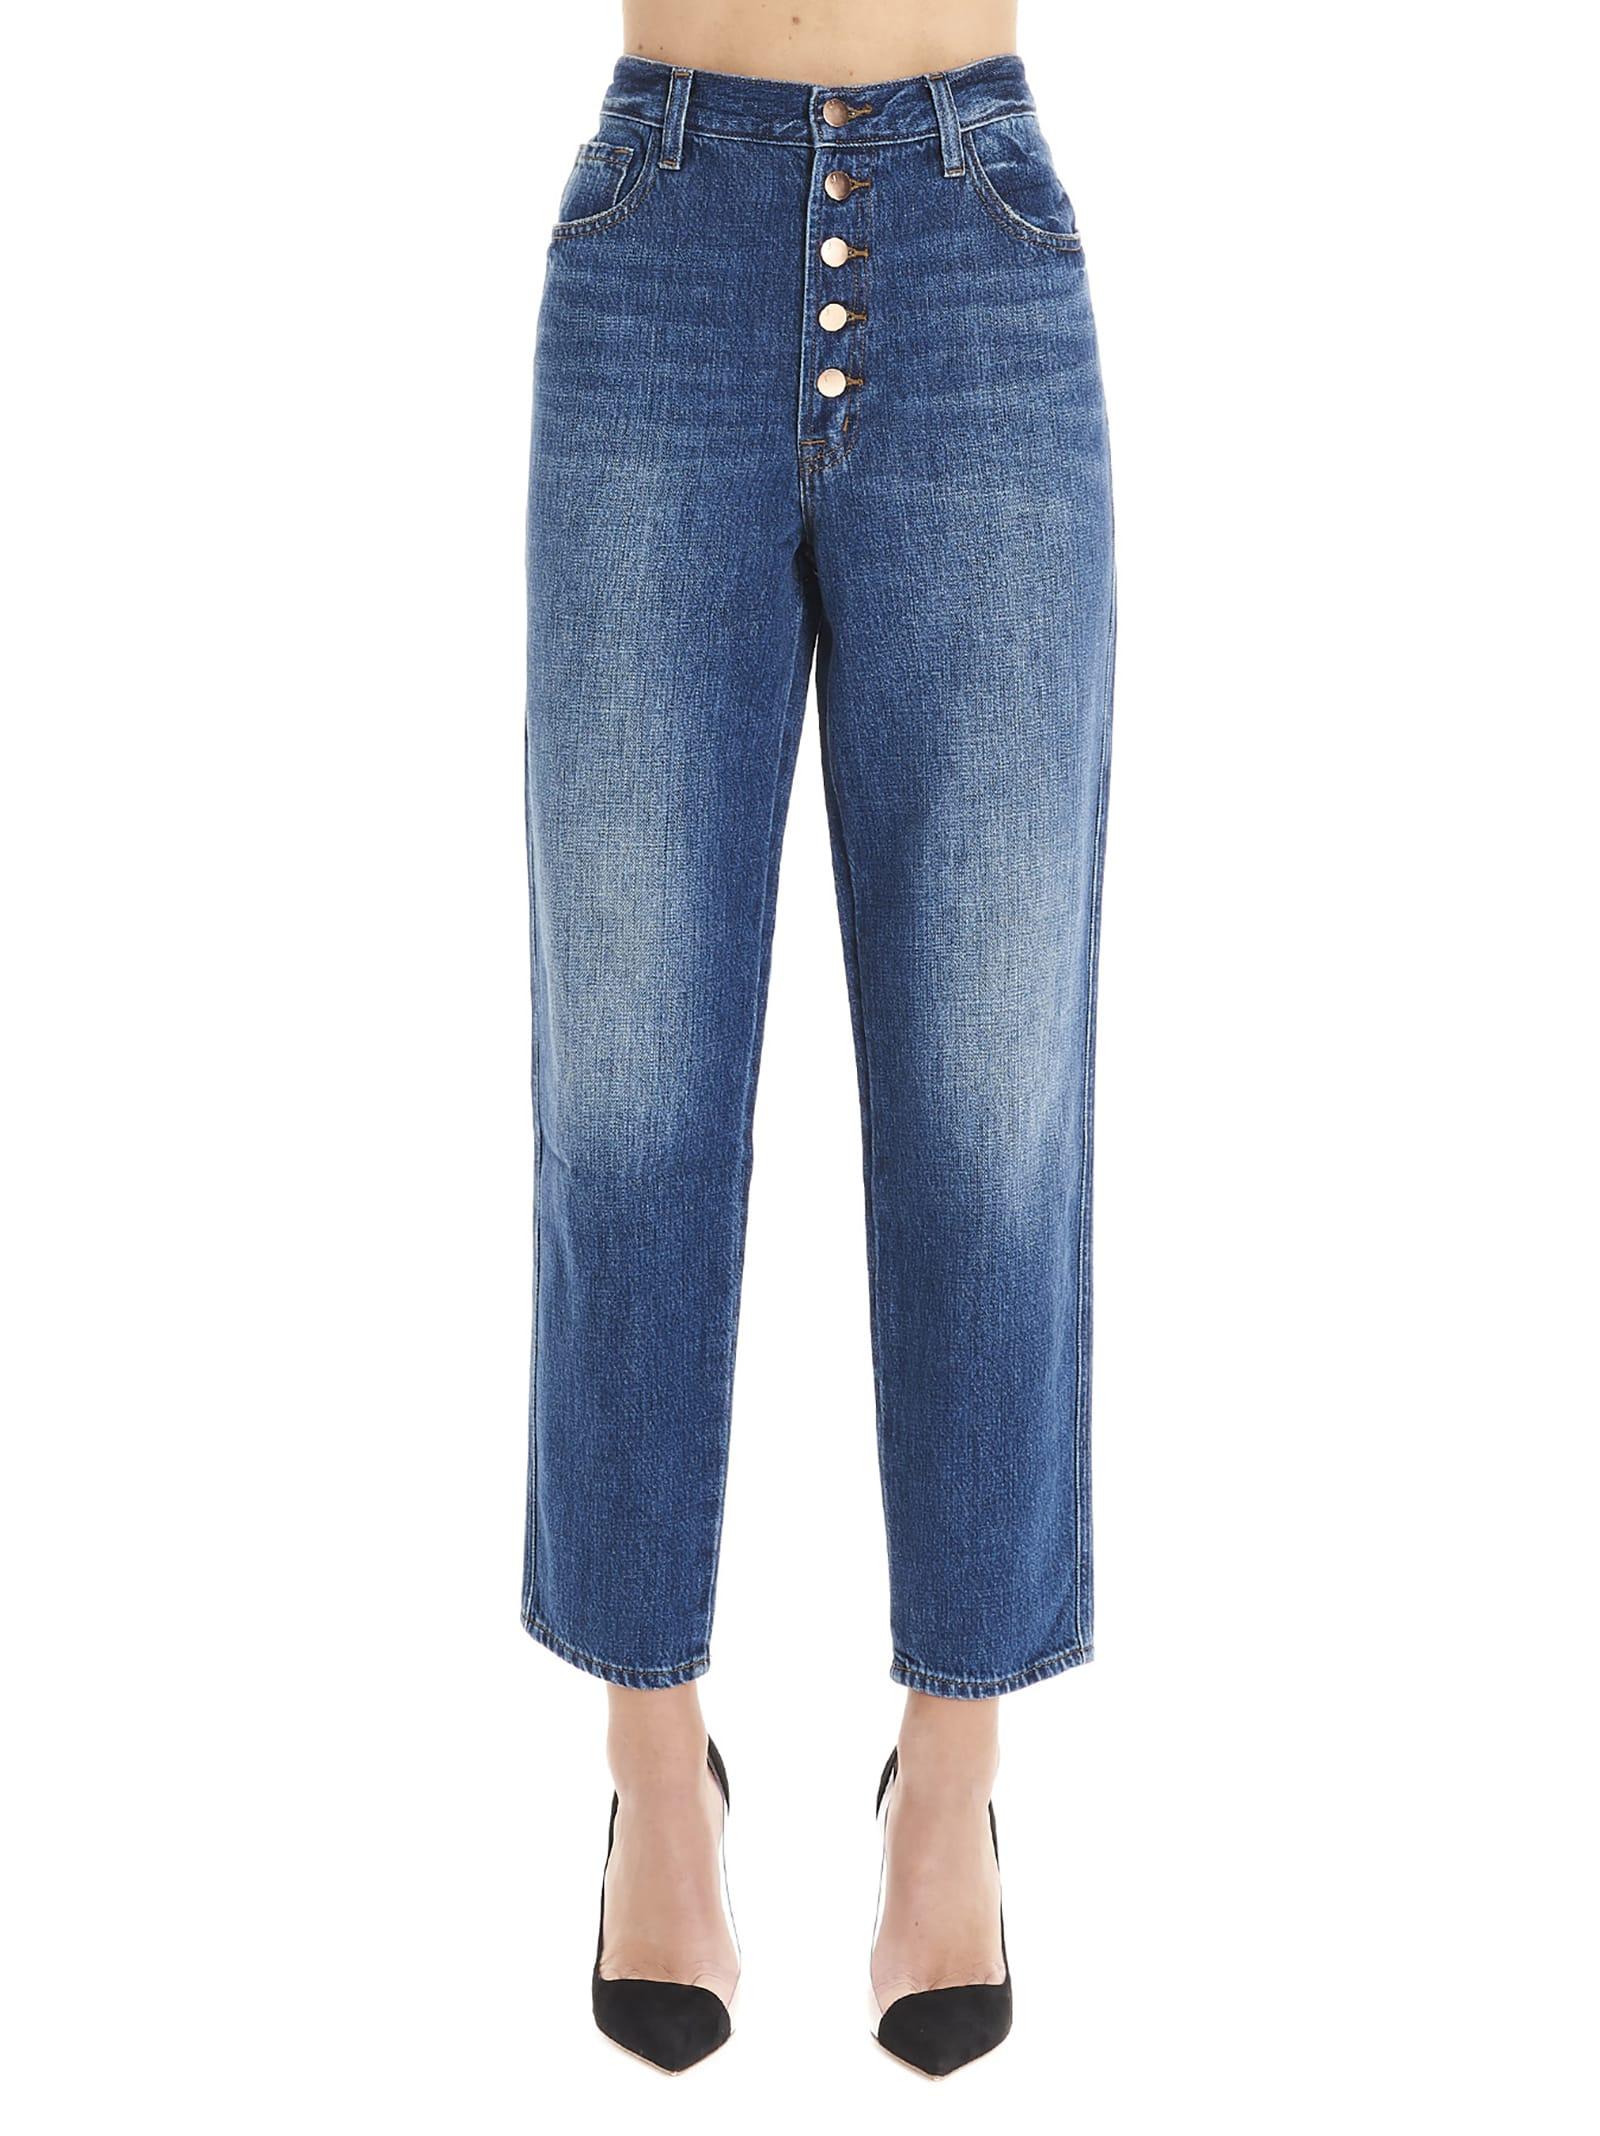 J Brand heather Jeans